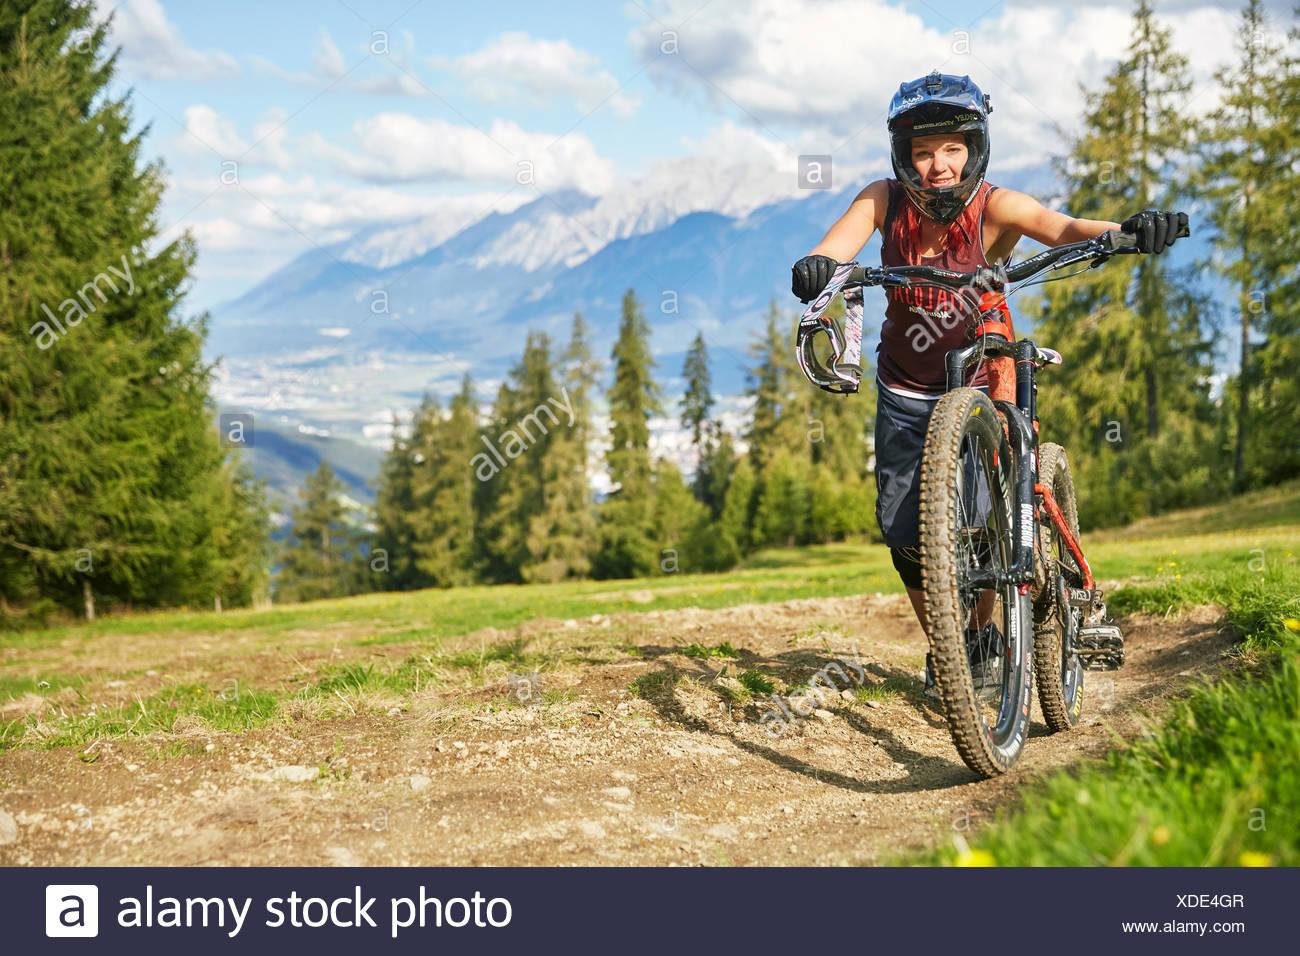 Downhill biker empujando la bicicleta de montaña en un sendero, Downhill Inn Valley detrás, Mutterer Alm, Muttereralmpark, Mutters, Tirol Imagen De Stock